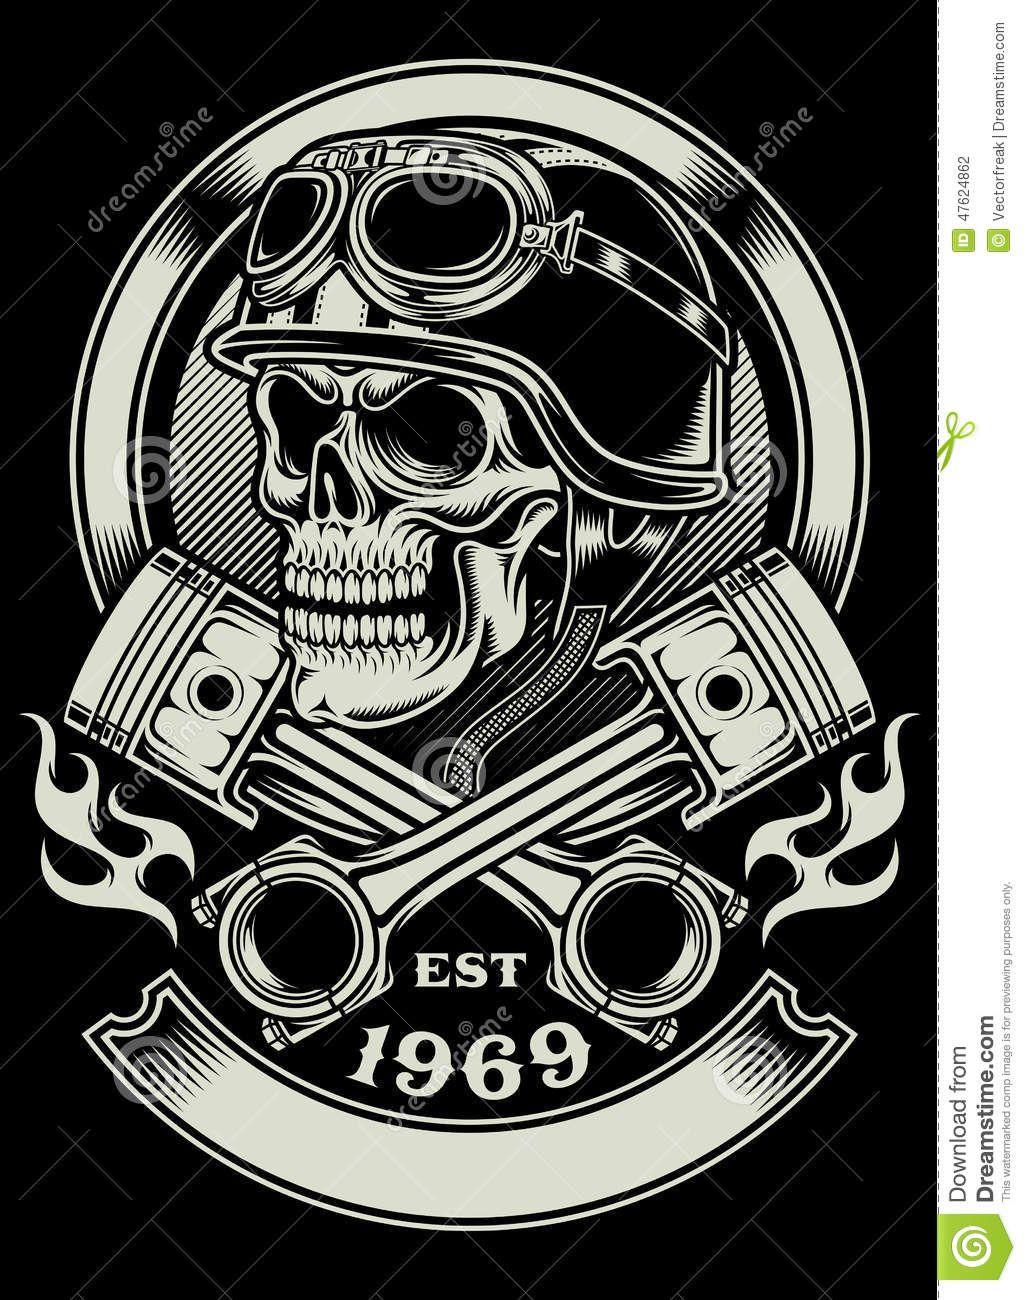 outlaw bikers symbols